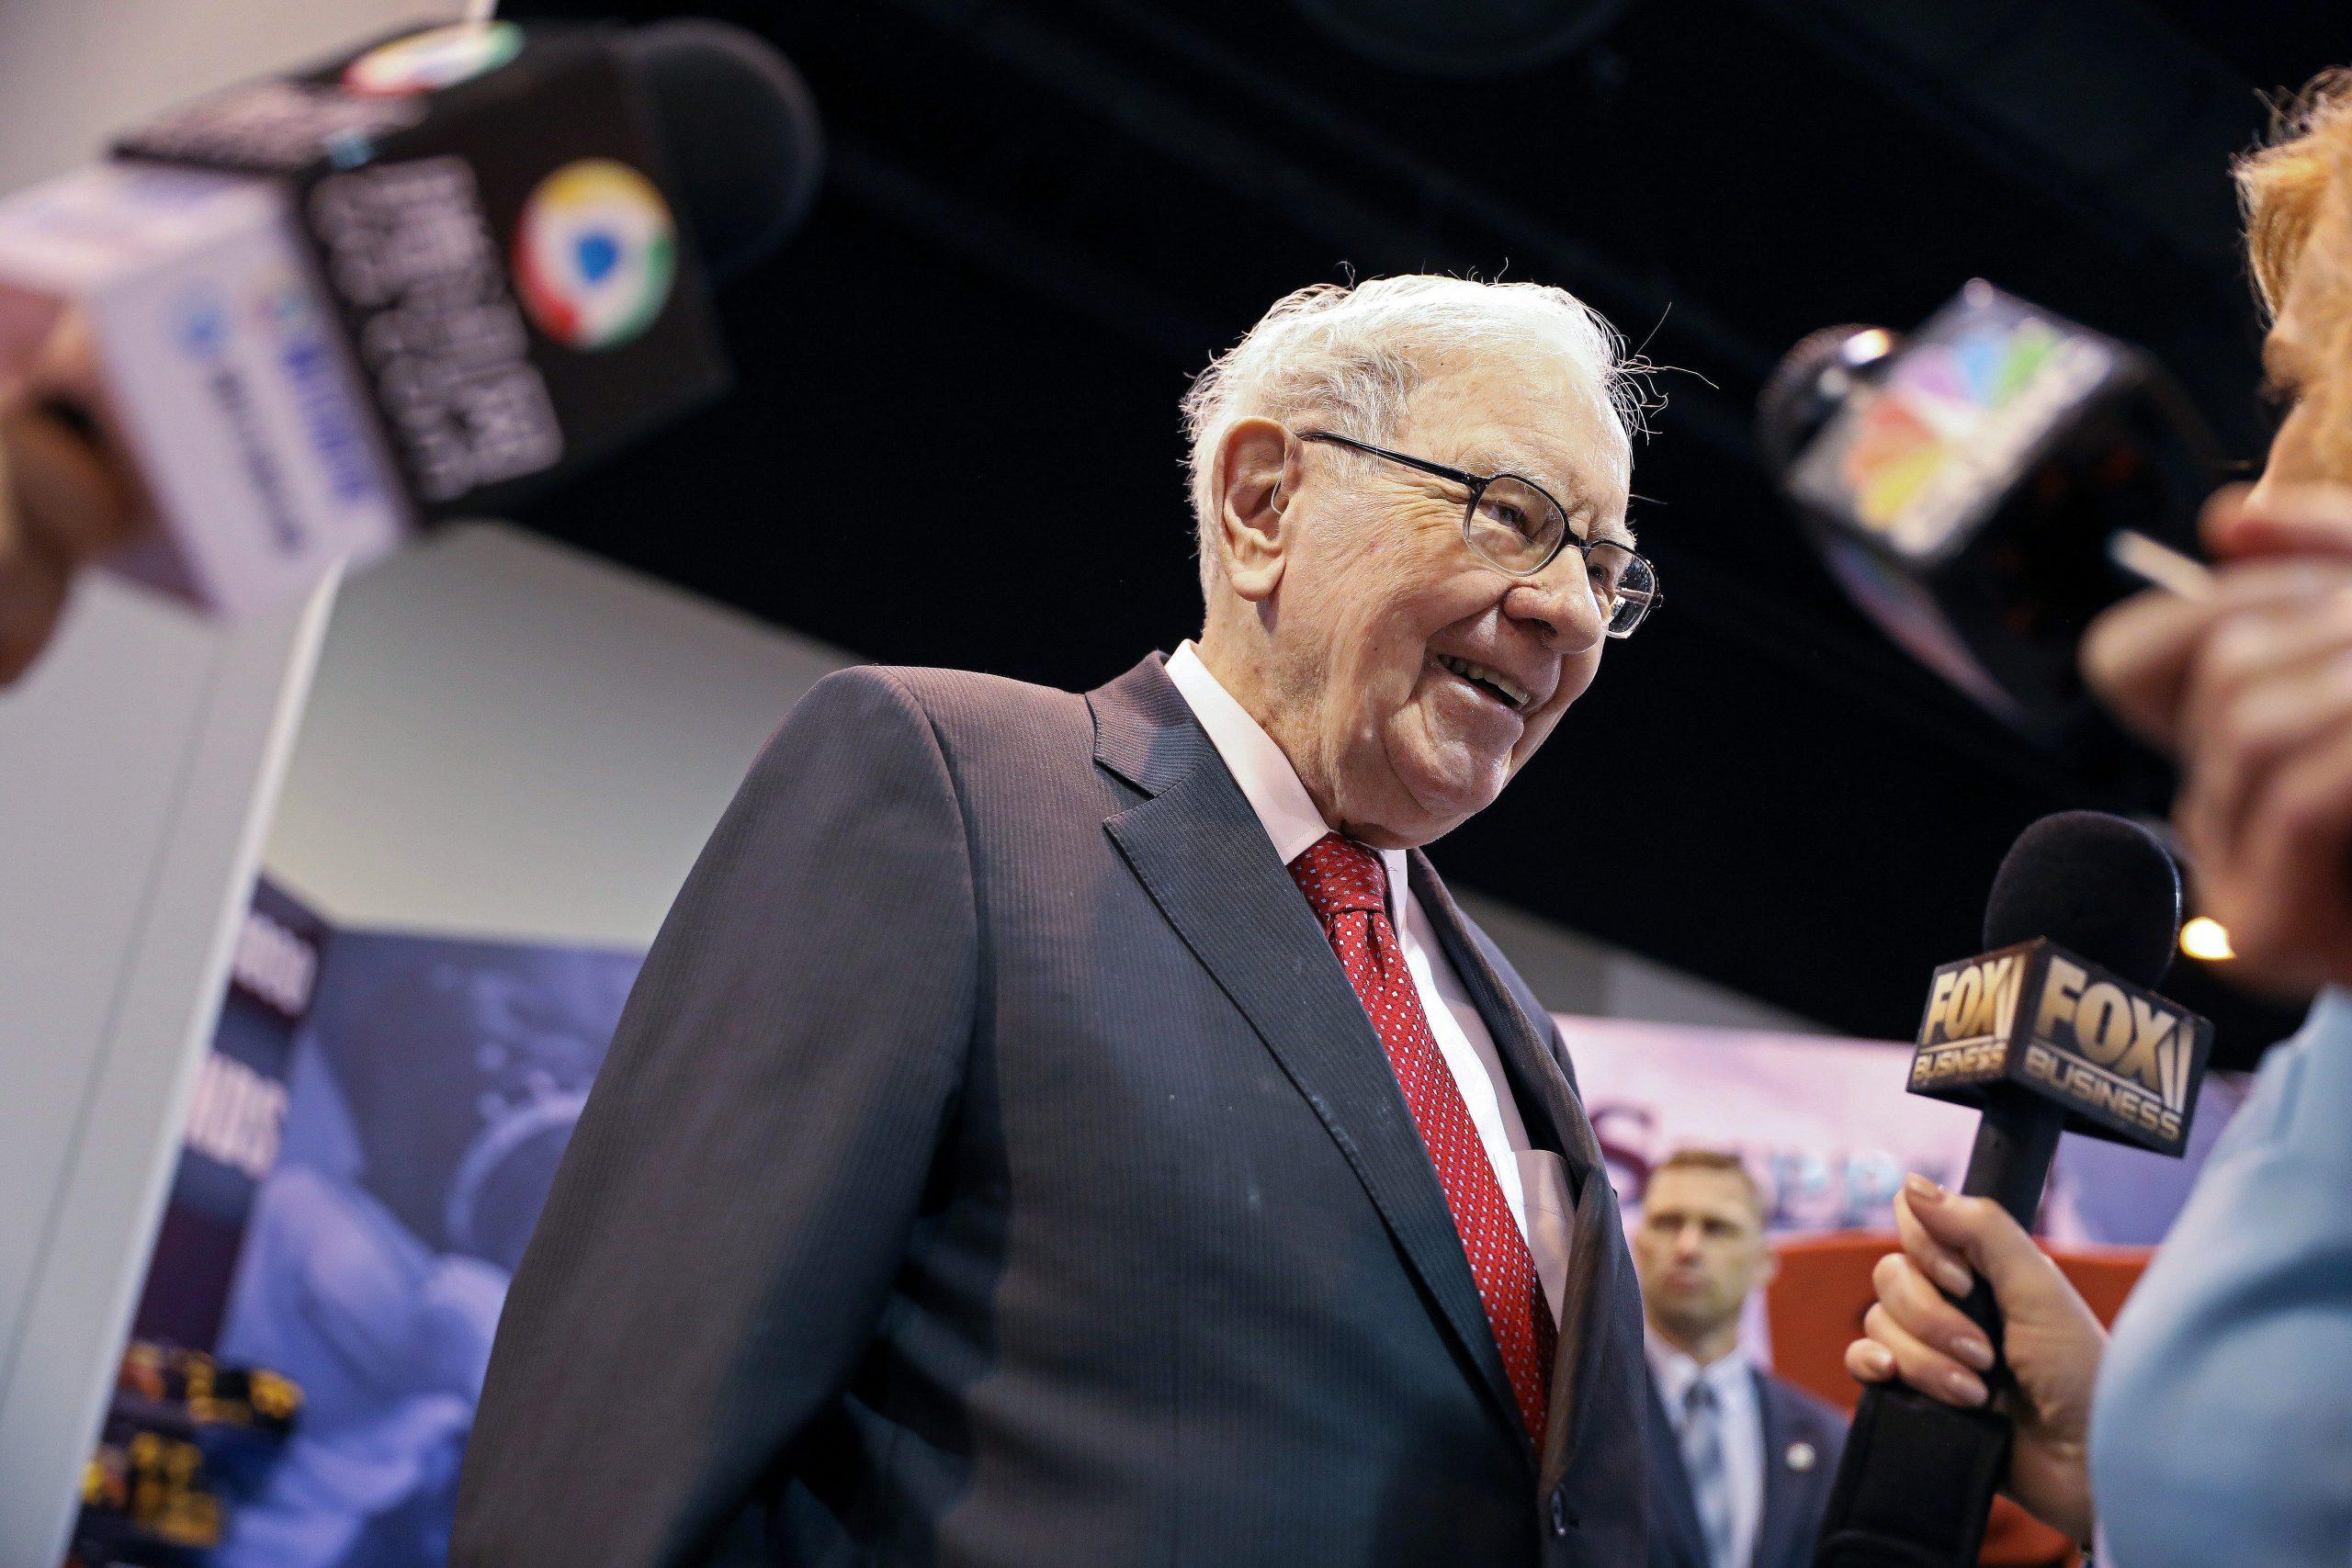 https://anysizedealsweek.com/wp-content/uploads/2020/09/Warren-Buffett-scaled.jpeg